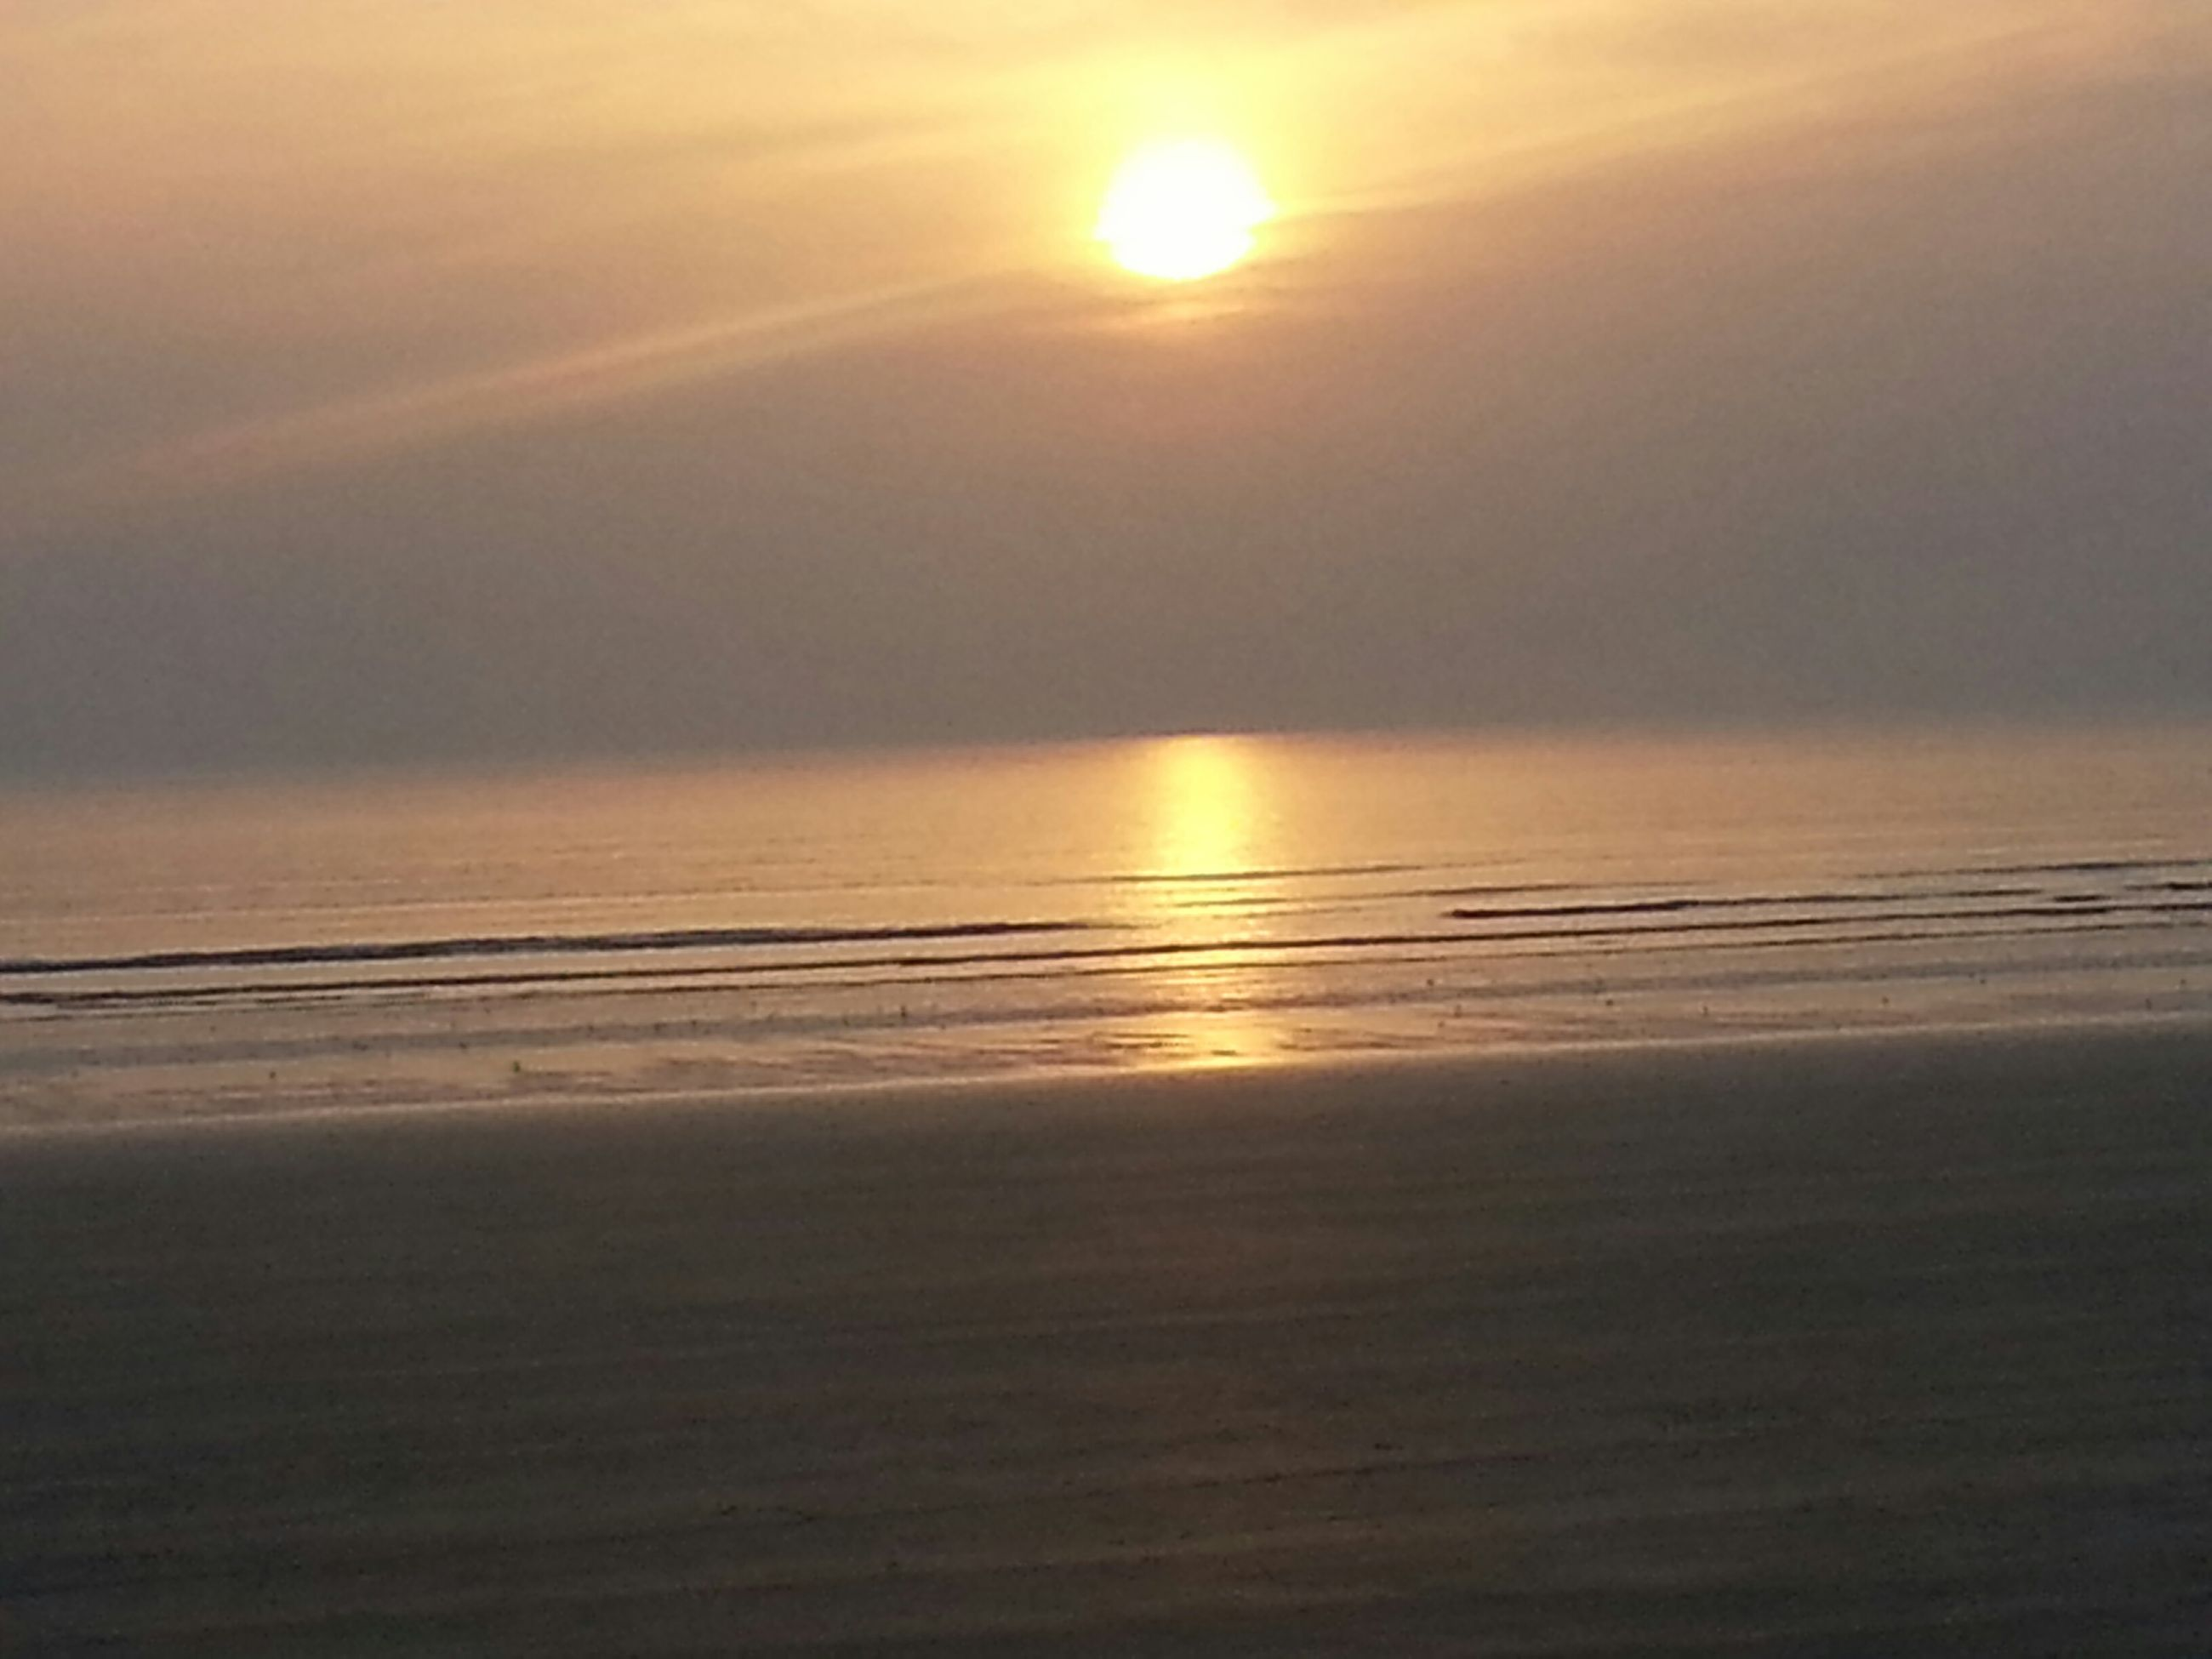 sun, sunset, sea, tranquil scene, scenics, water, horizon over water, tranquility, beauty in nature, reflection, beach, sunlight, idyllic, sky, nature, sunbeam, orange color, shore, lens flare, outdoors